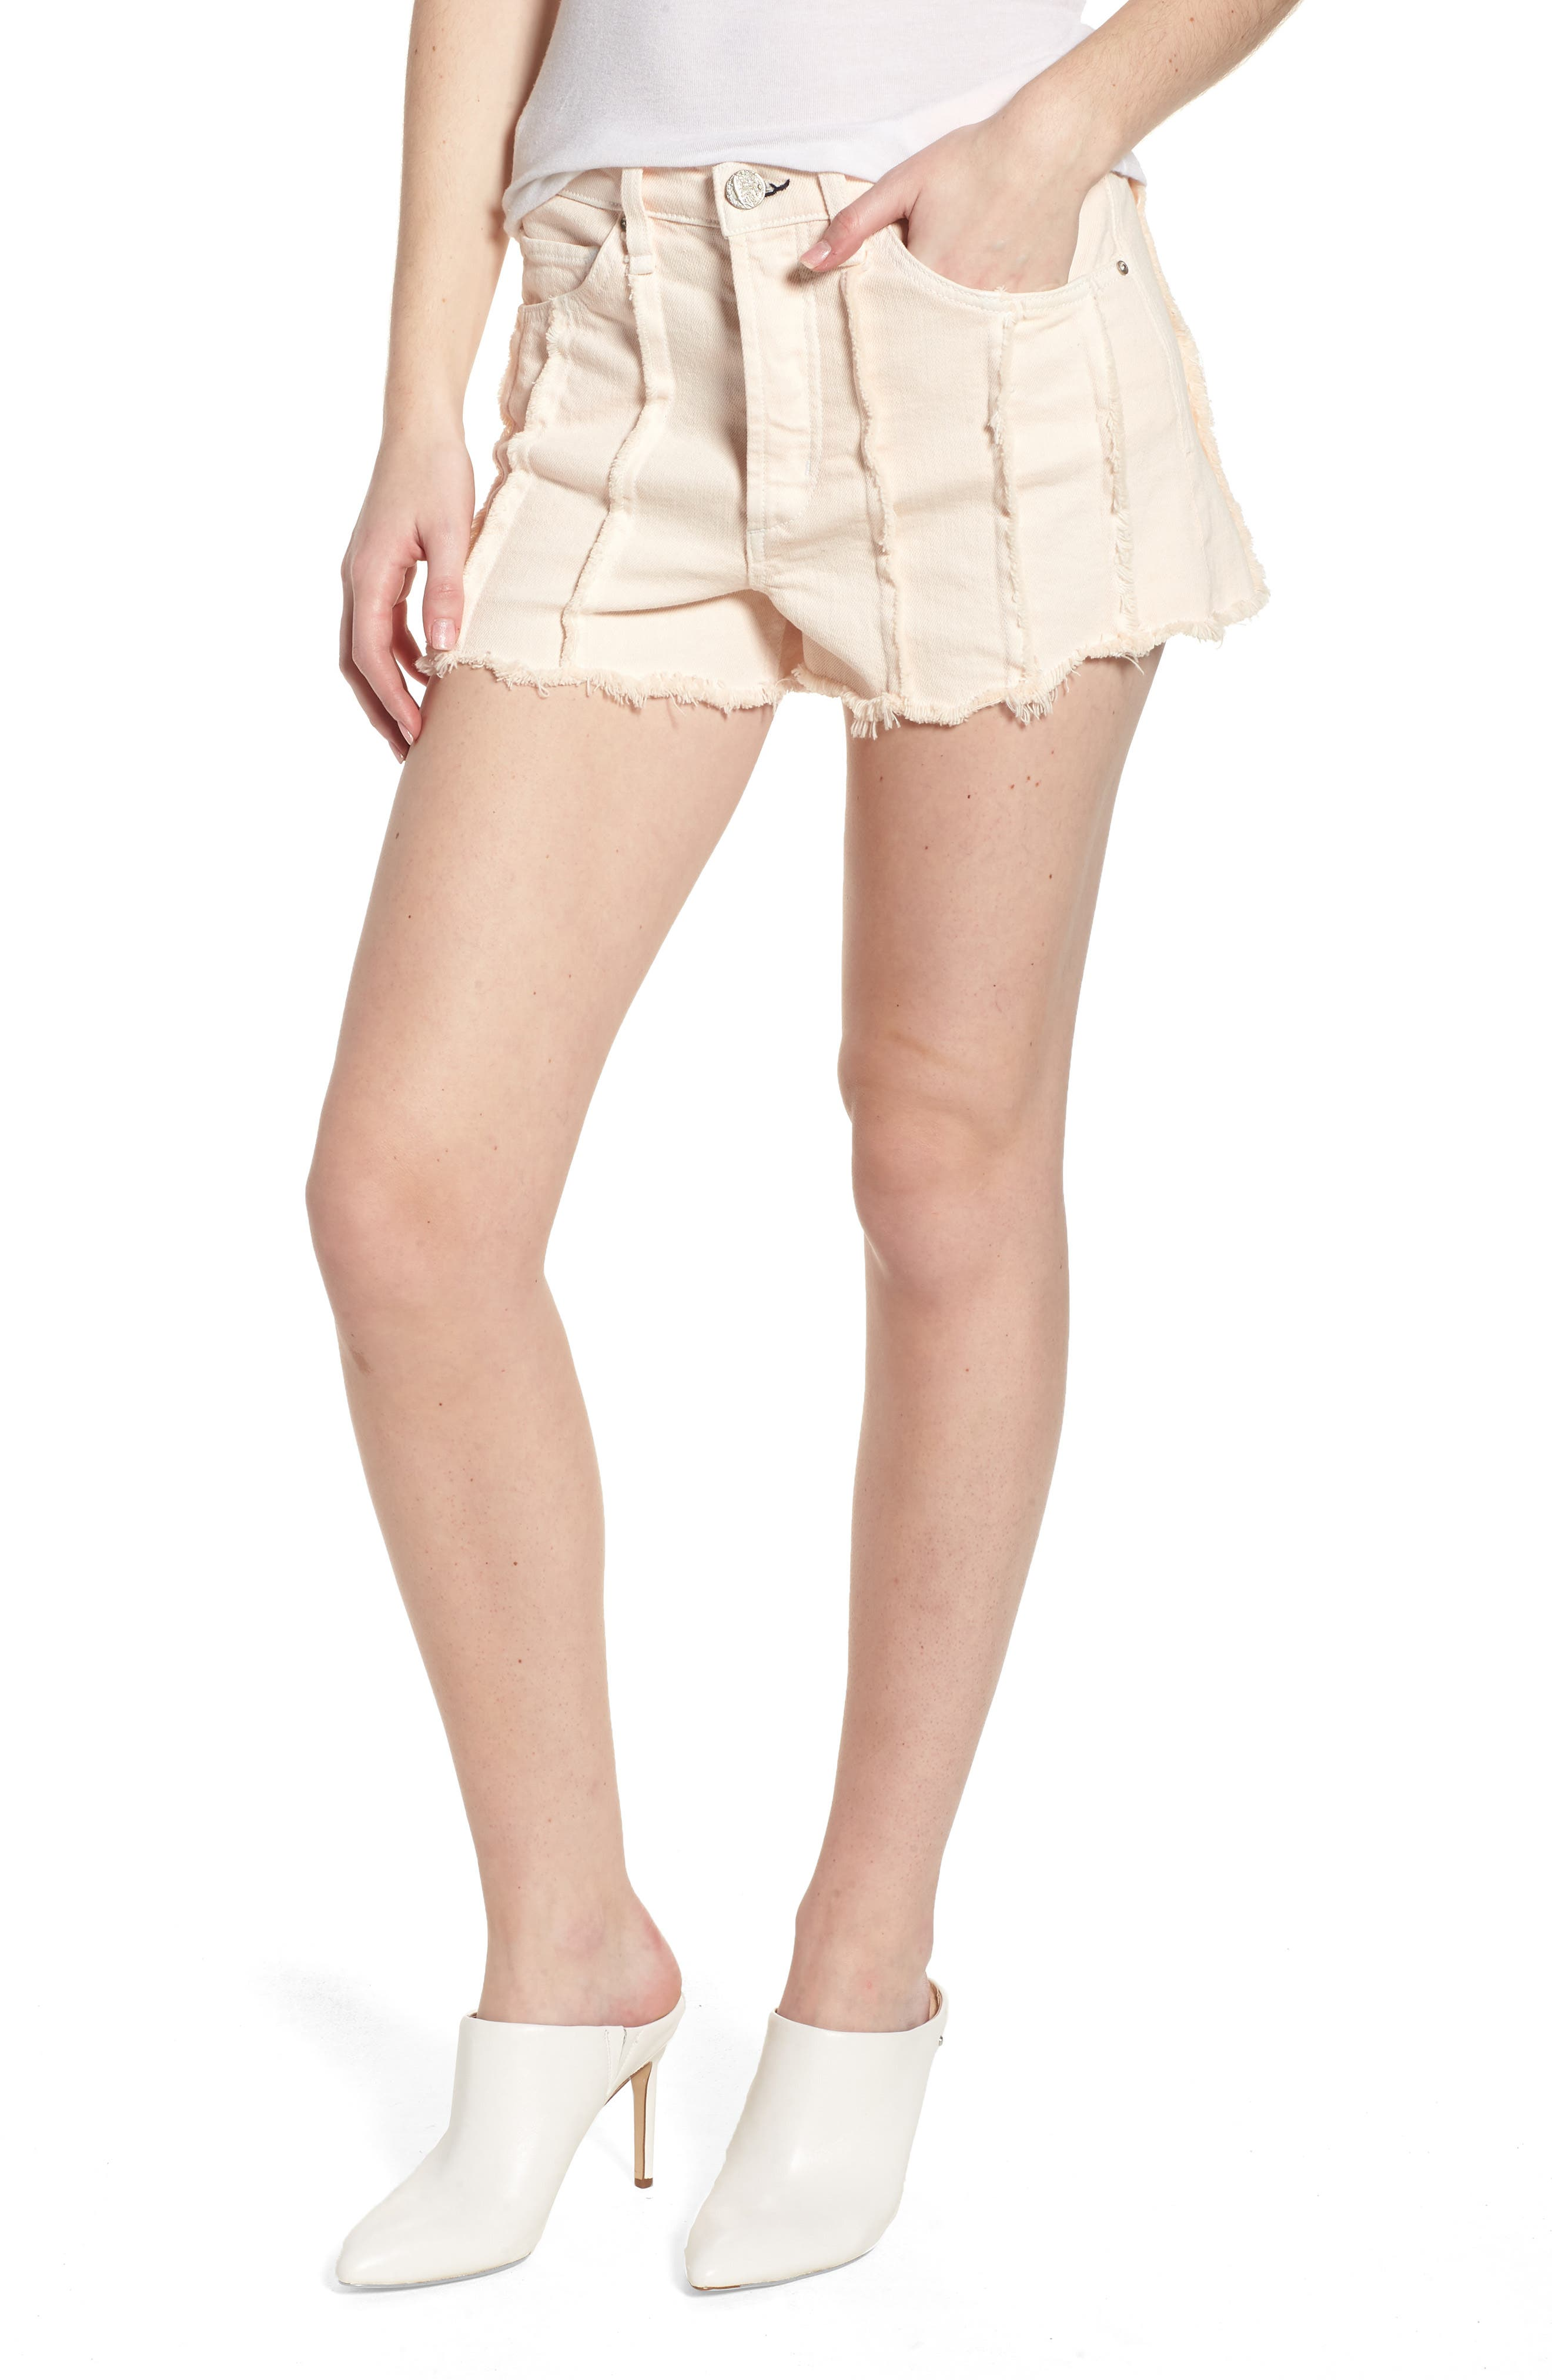 McGuire Georgia May High Waist Shorts